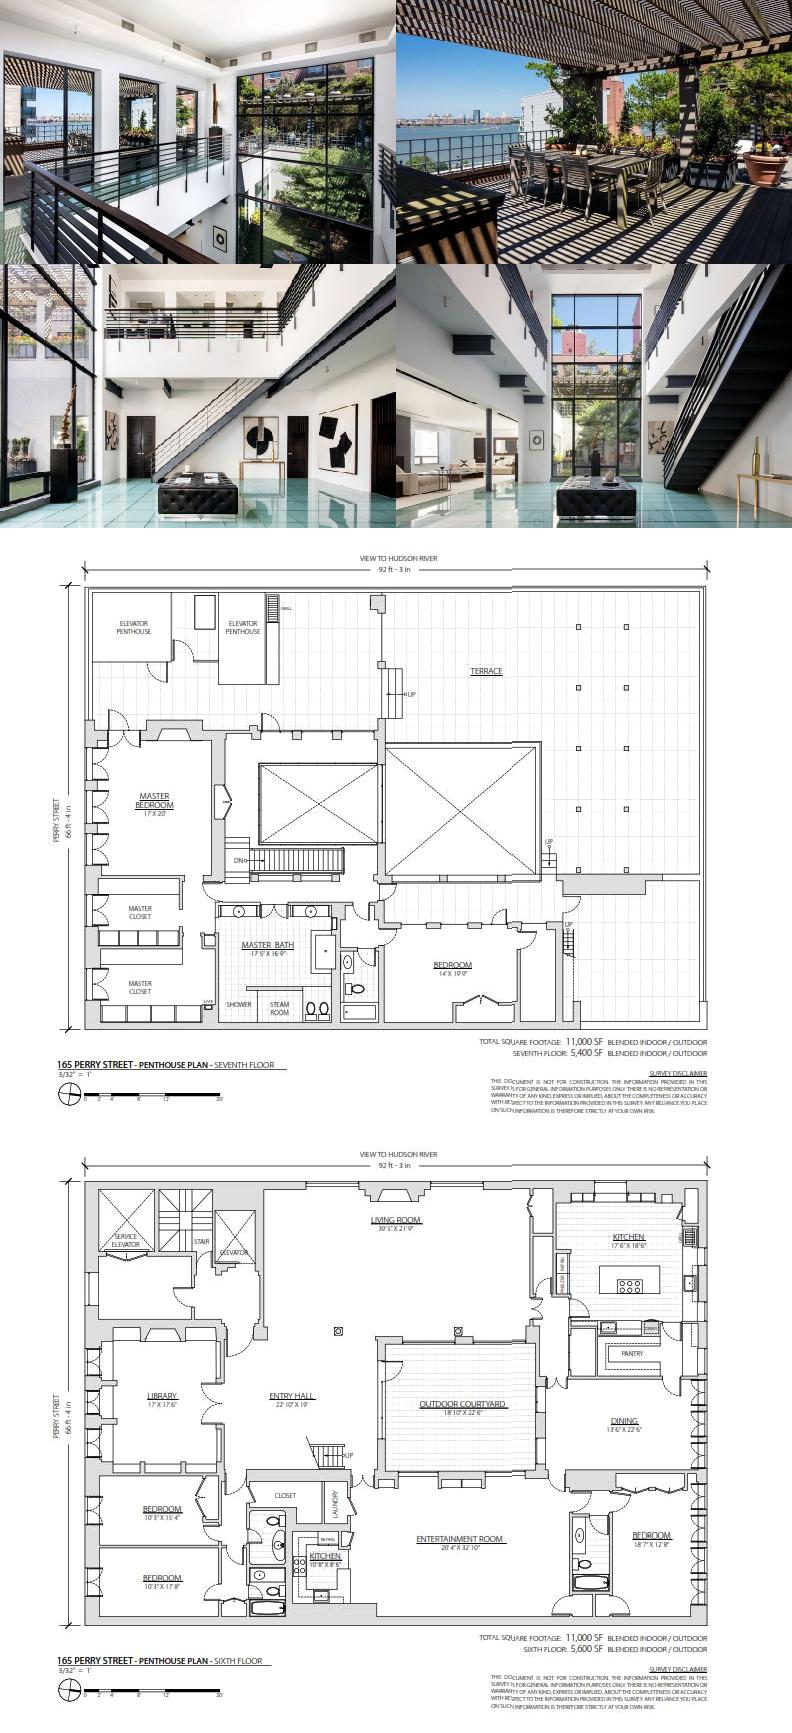 Robert deniro   onetime west village penthouse gets discounted yet again apartment floor plans house also rh pinterest